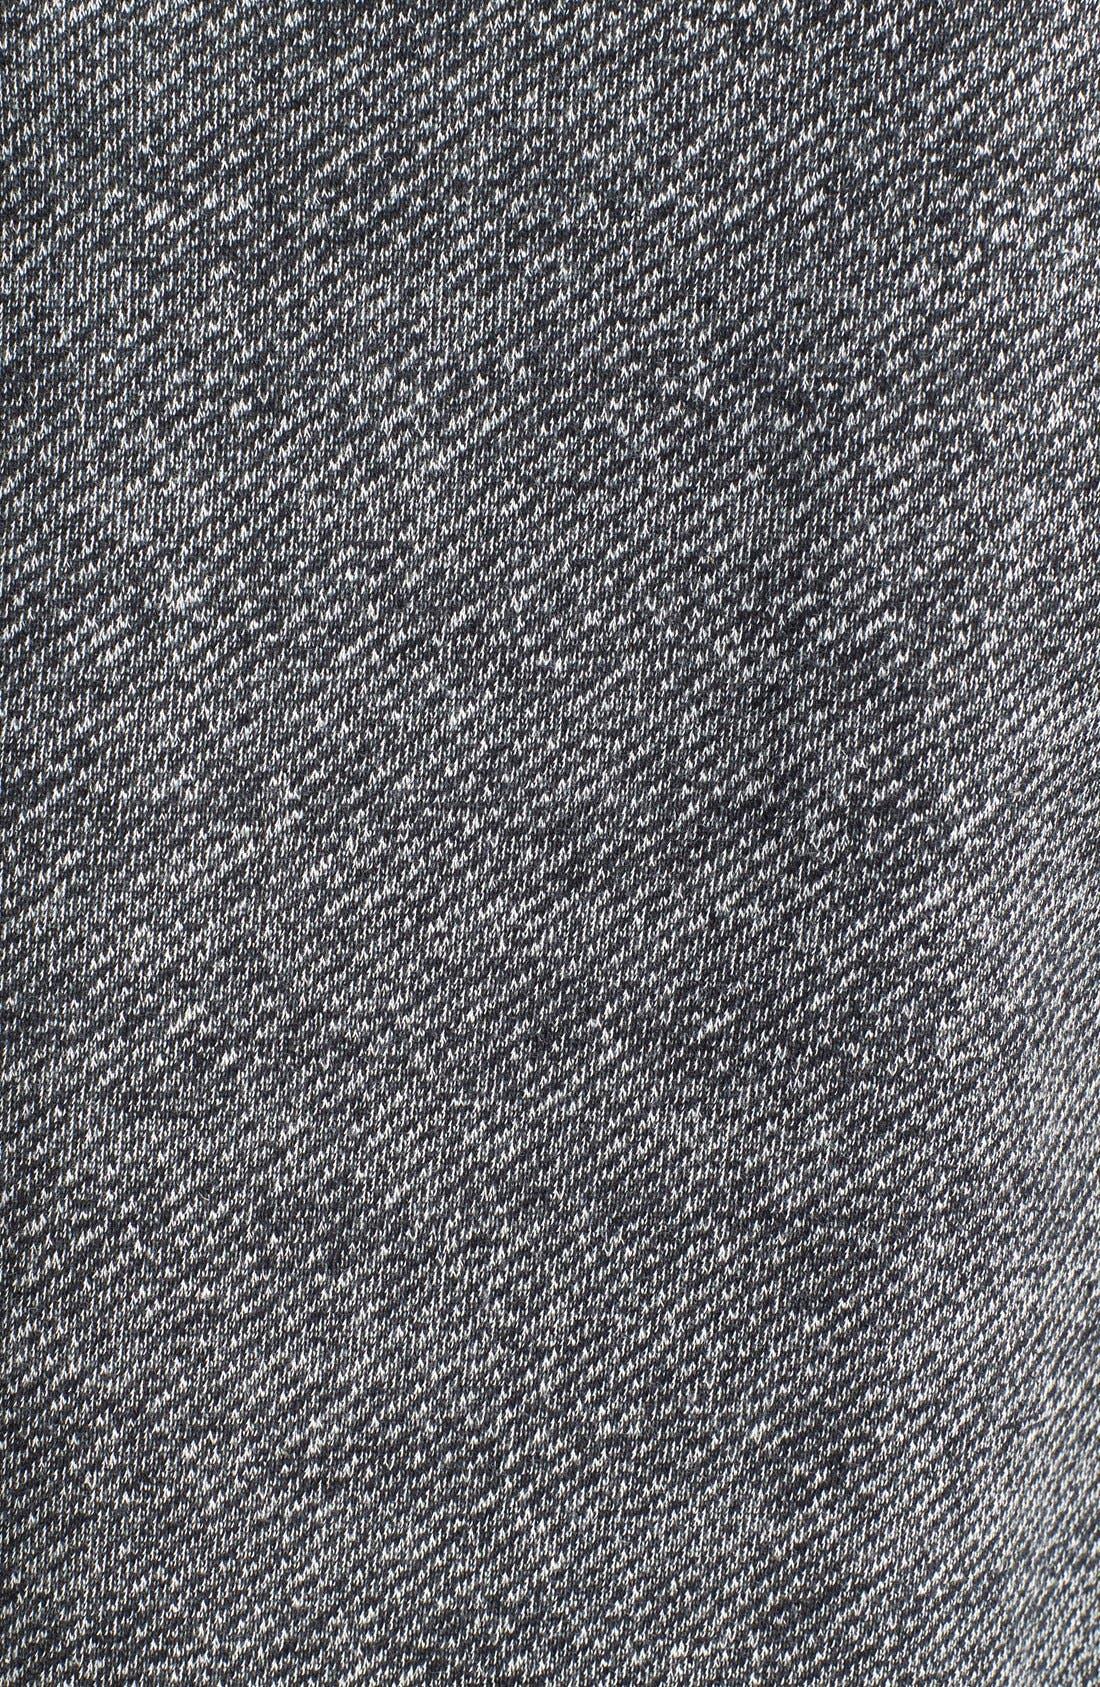 Alternate Image 4  - French Connection 'Mississippi Mélange' Sweater Knit Shift Dress